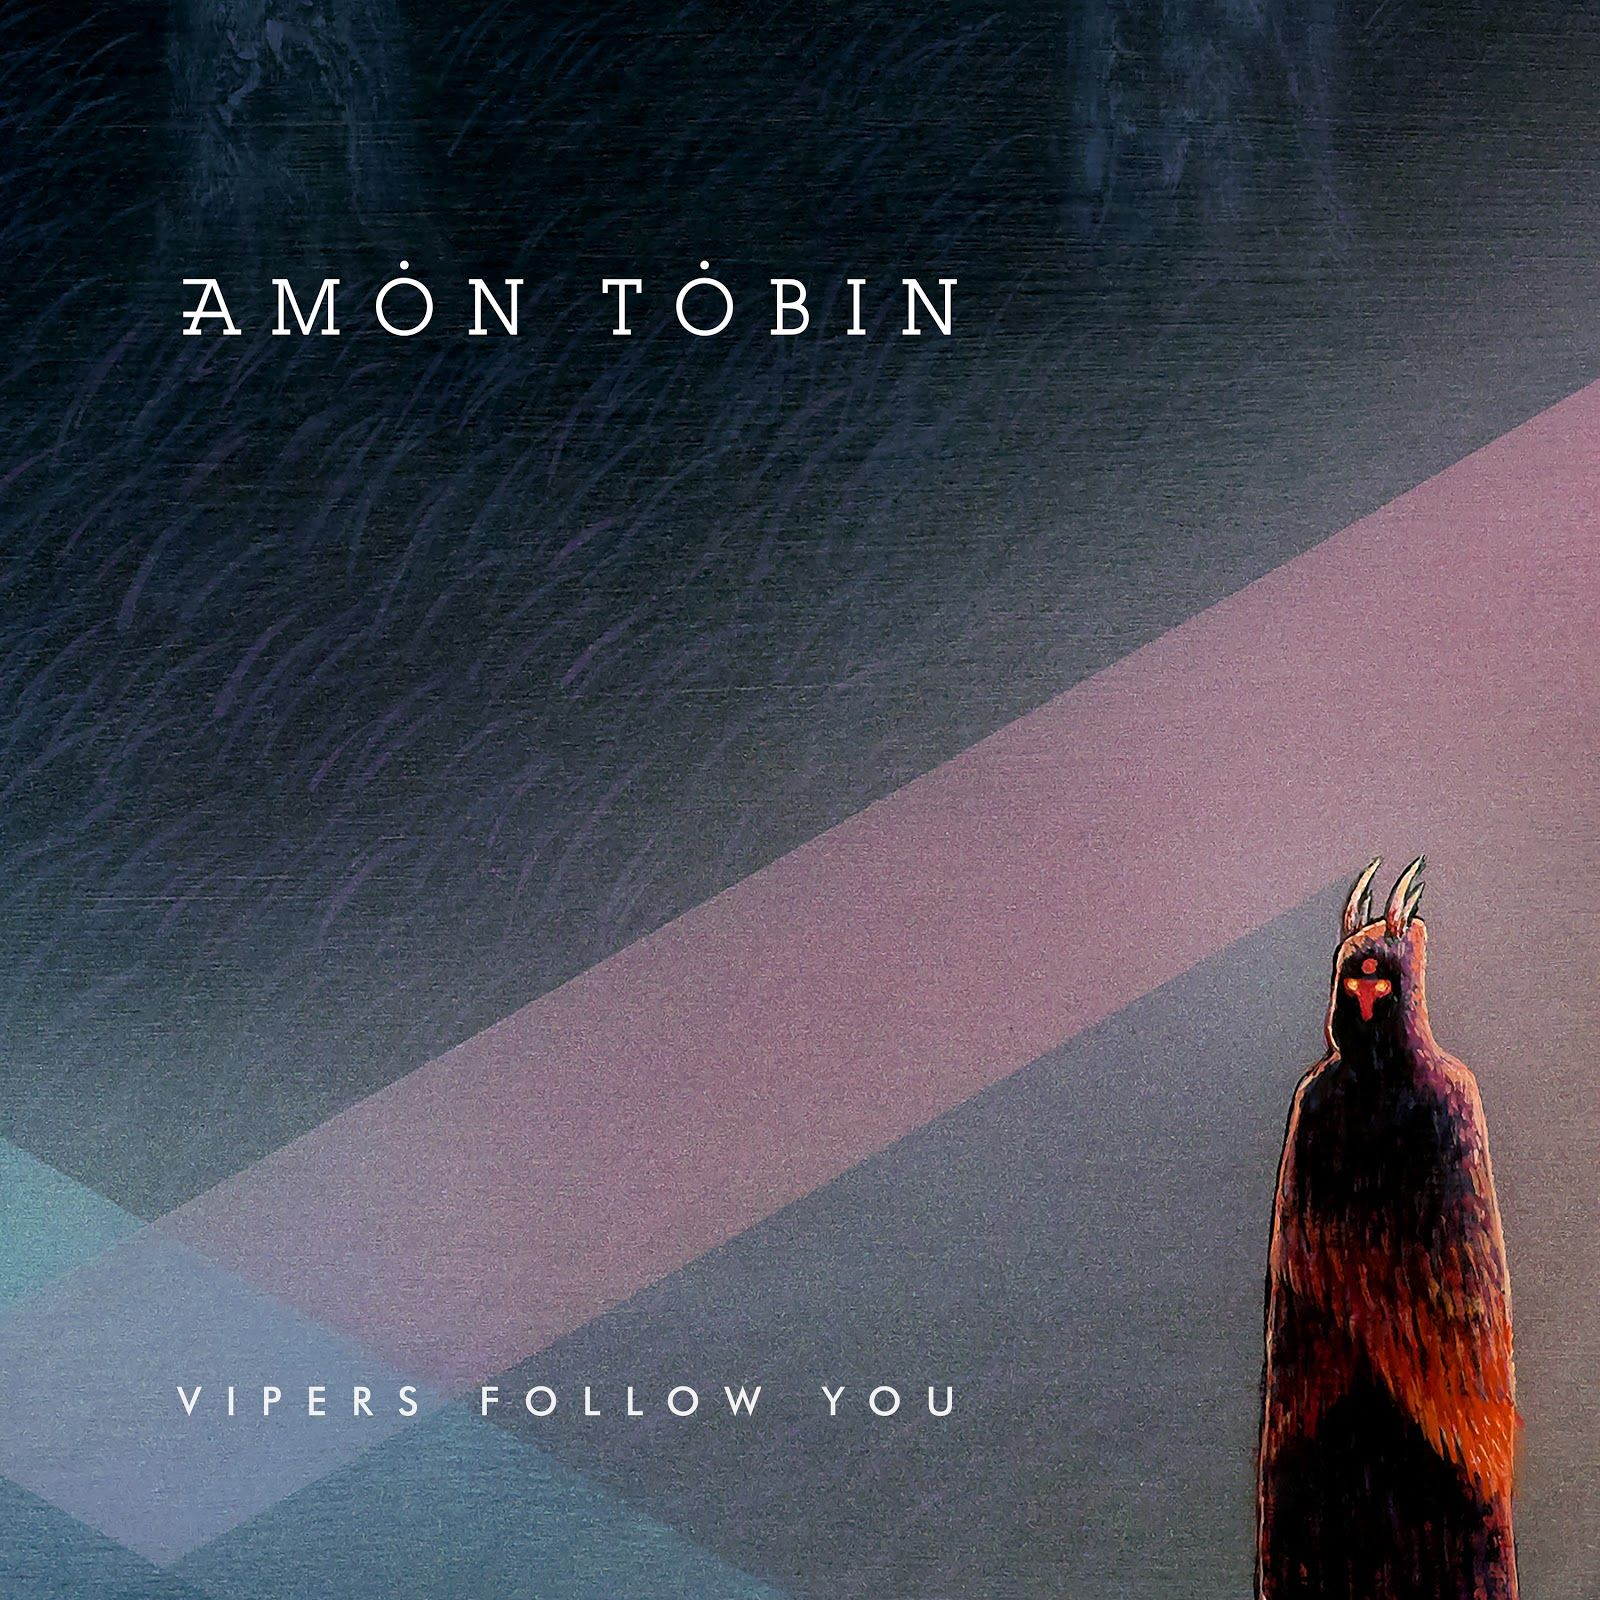 amontobin-vipersfollowyou-fullres-3000px-single2.jpg